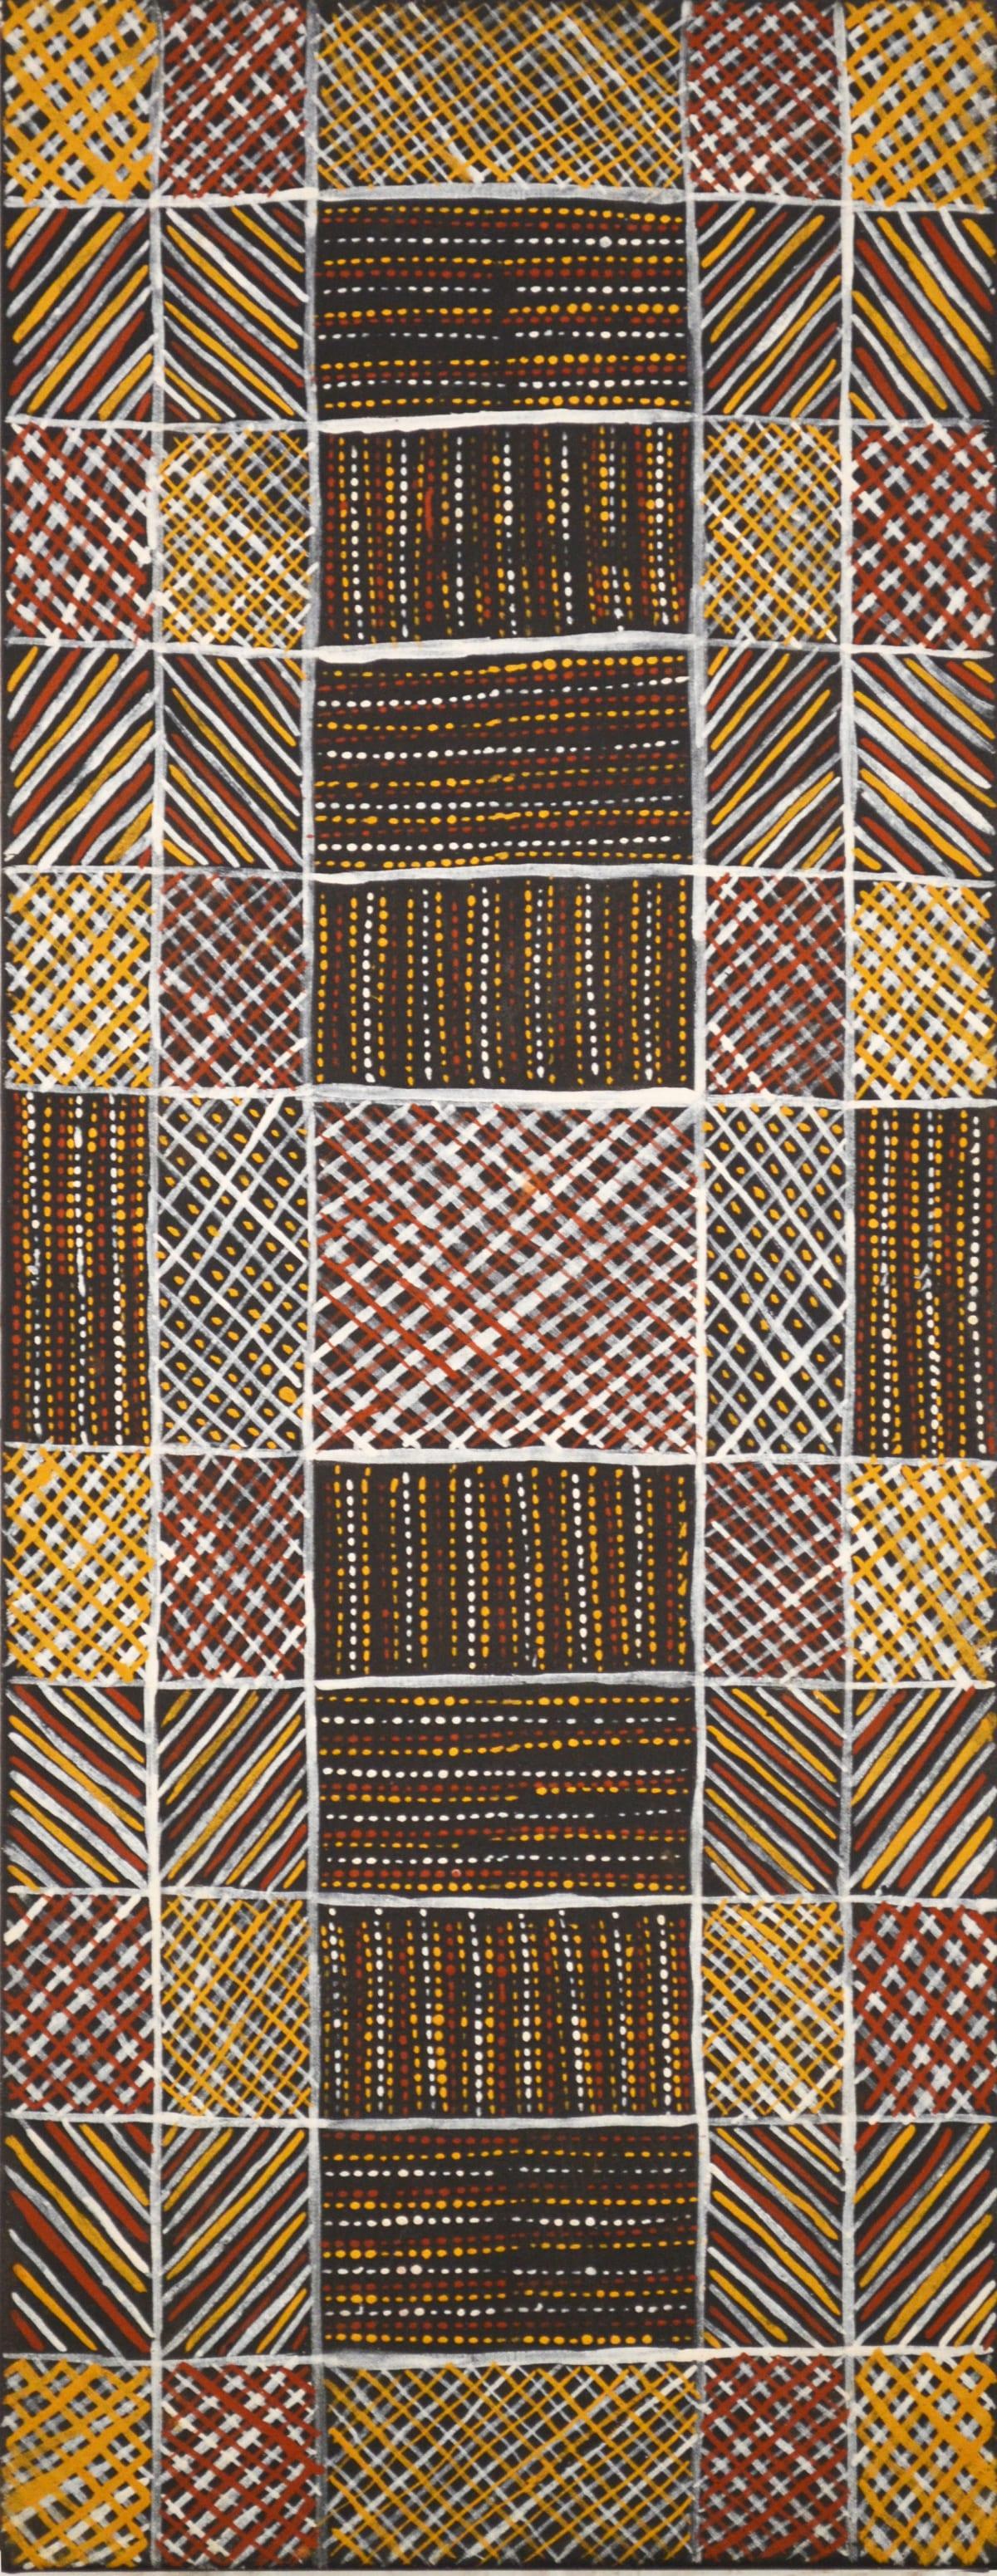 Brian Farmer Illortamini Jilamara natural ochres on canvas 30 x 80 cm